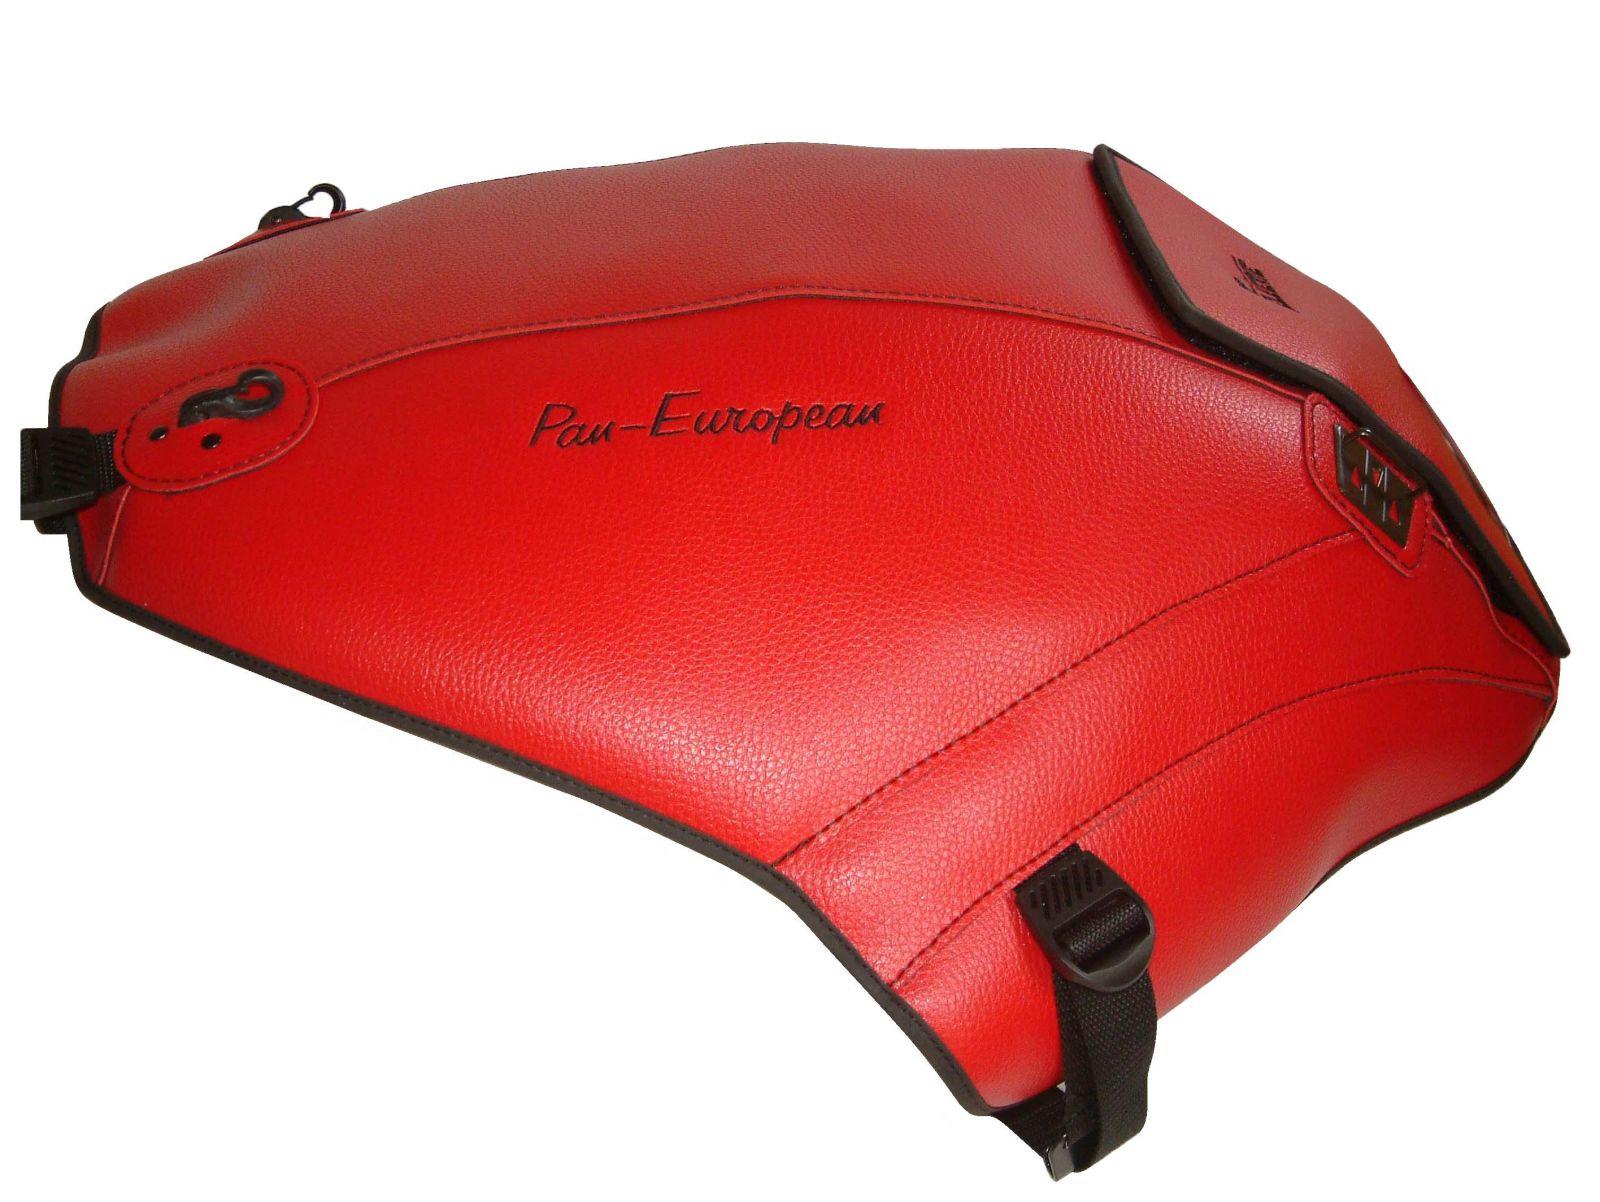 Capa de depósito TPR4410 - HONDA PAN EUROPEAN ST 1100 [1990-2001]